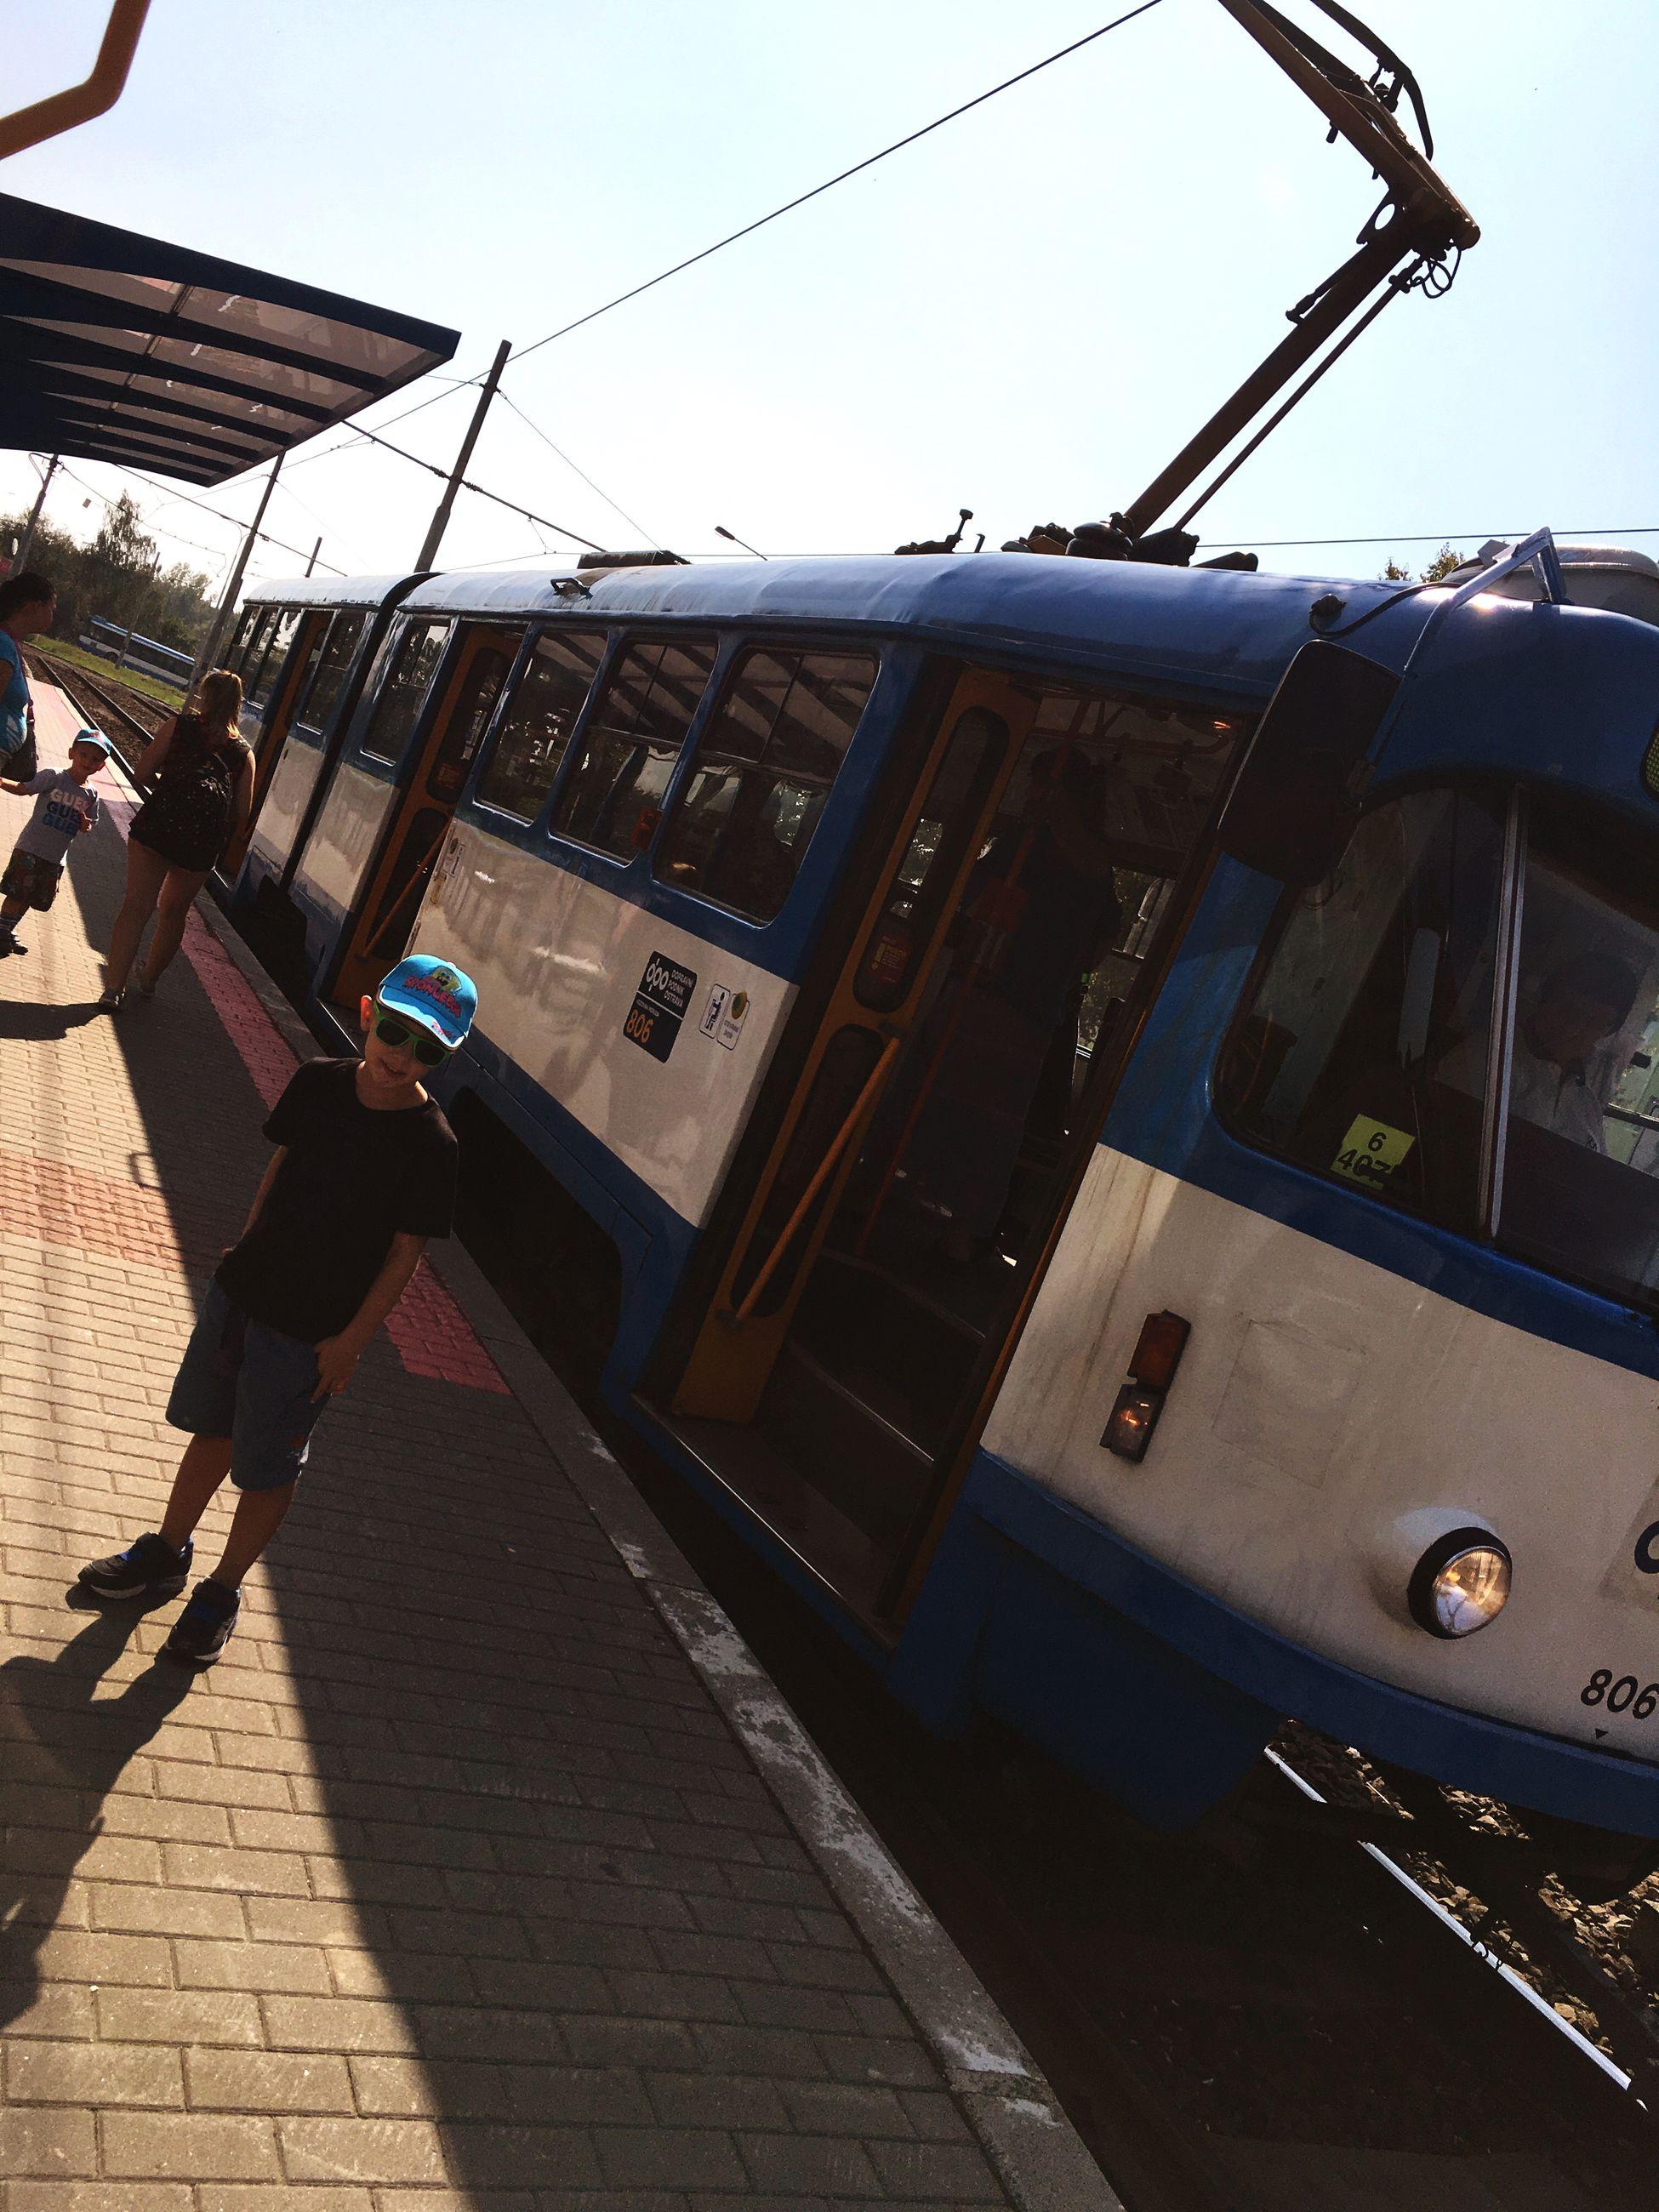 Railway Station Platform ☀️☀️☀️🌞🍡🍦🍭🚠🚠🚠 Land Vehicle